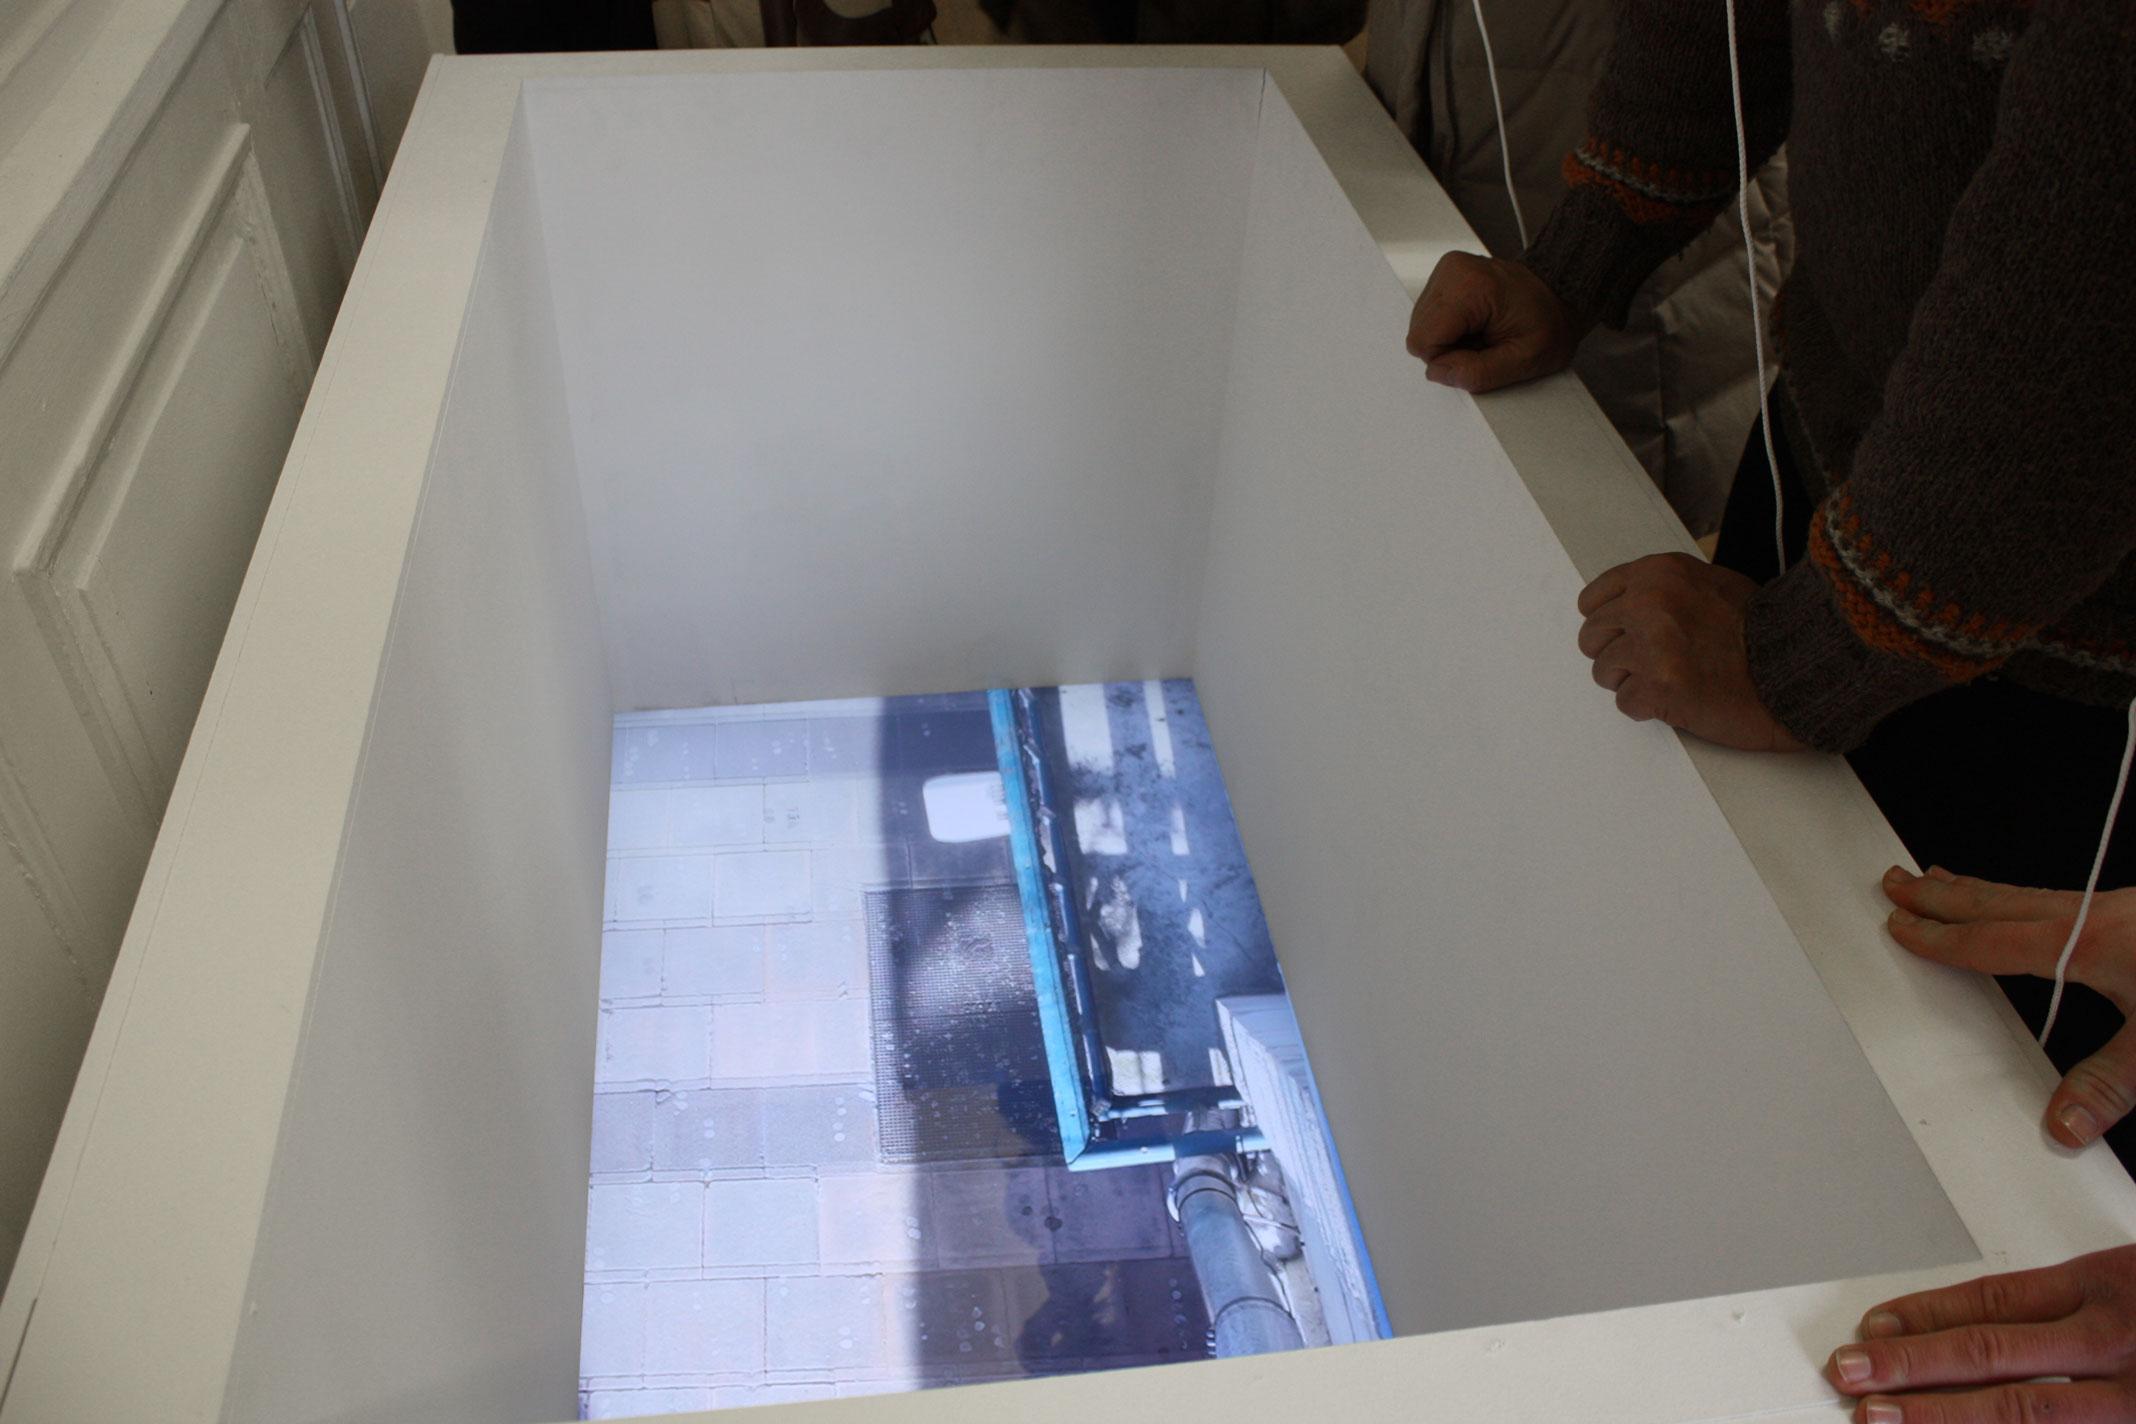 videodrome-schaulustige-3-d-videoloop